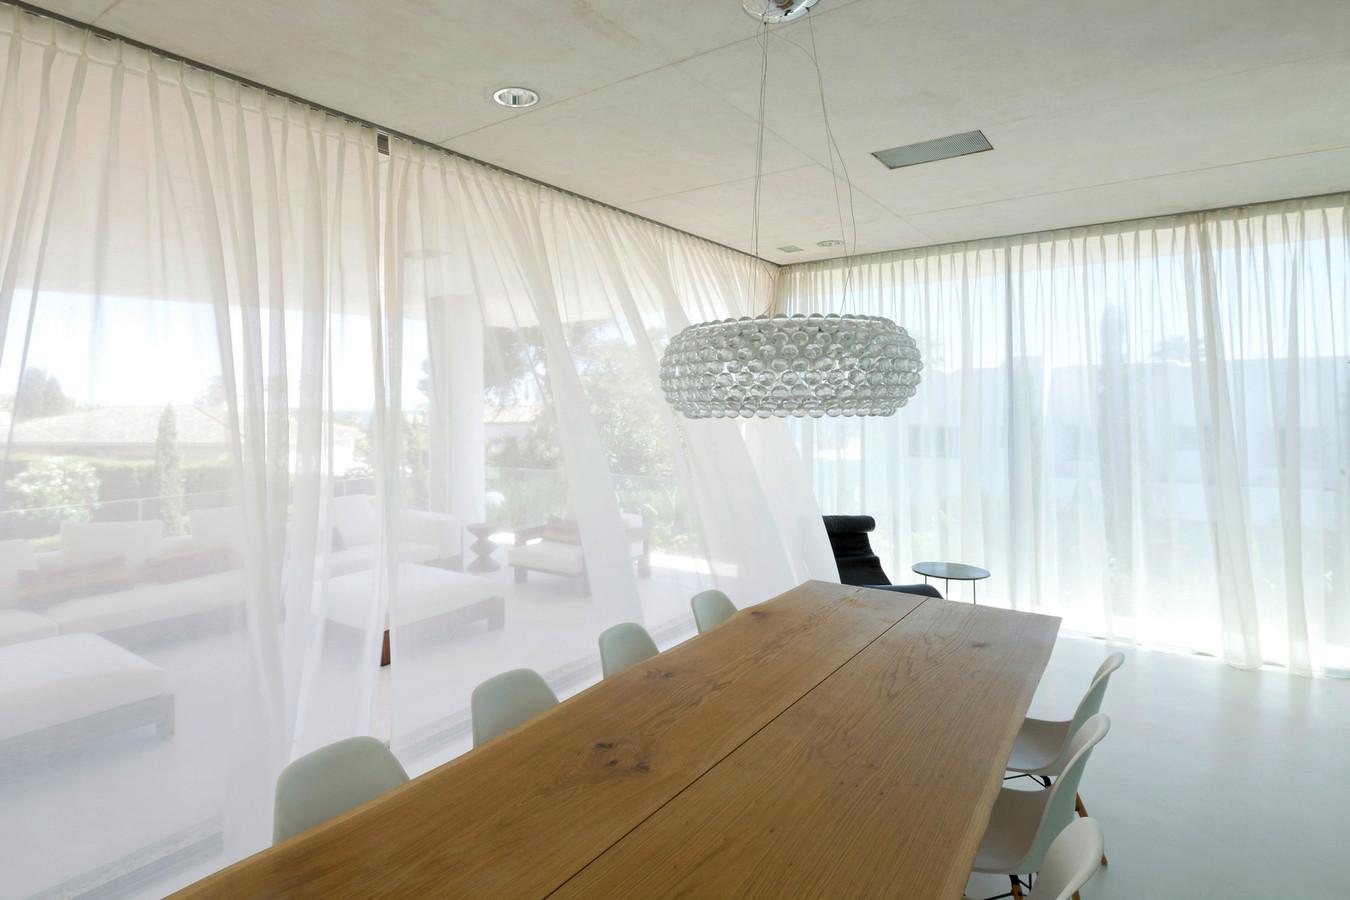 Wiel Arets Architects